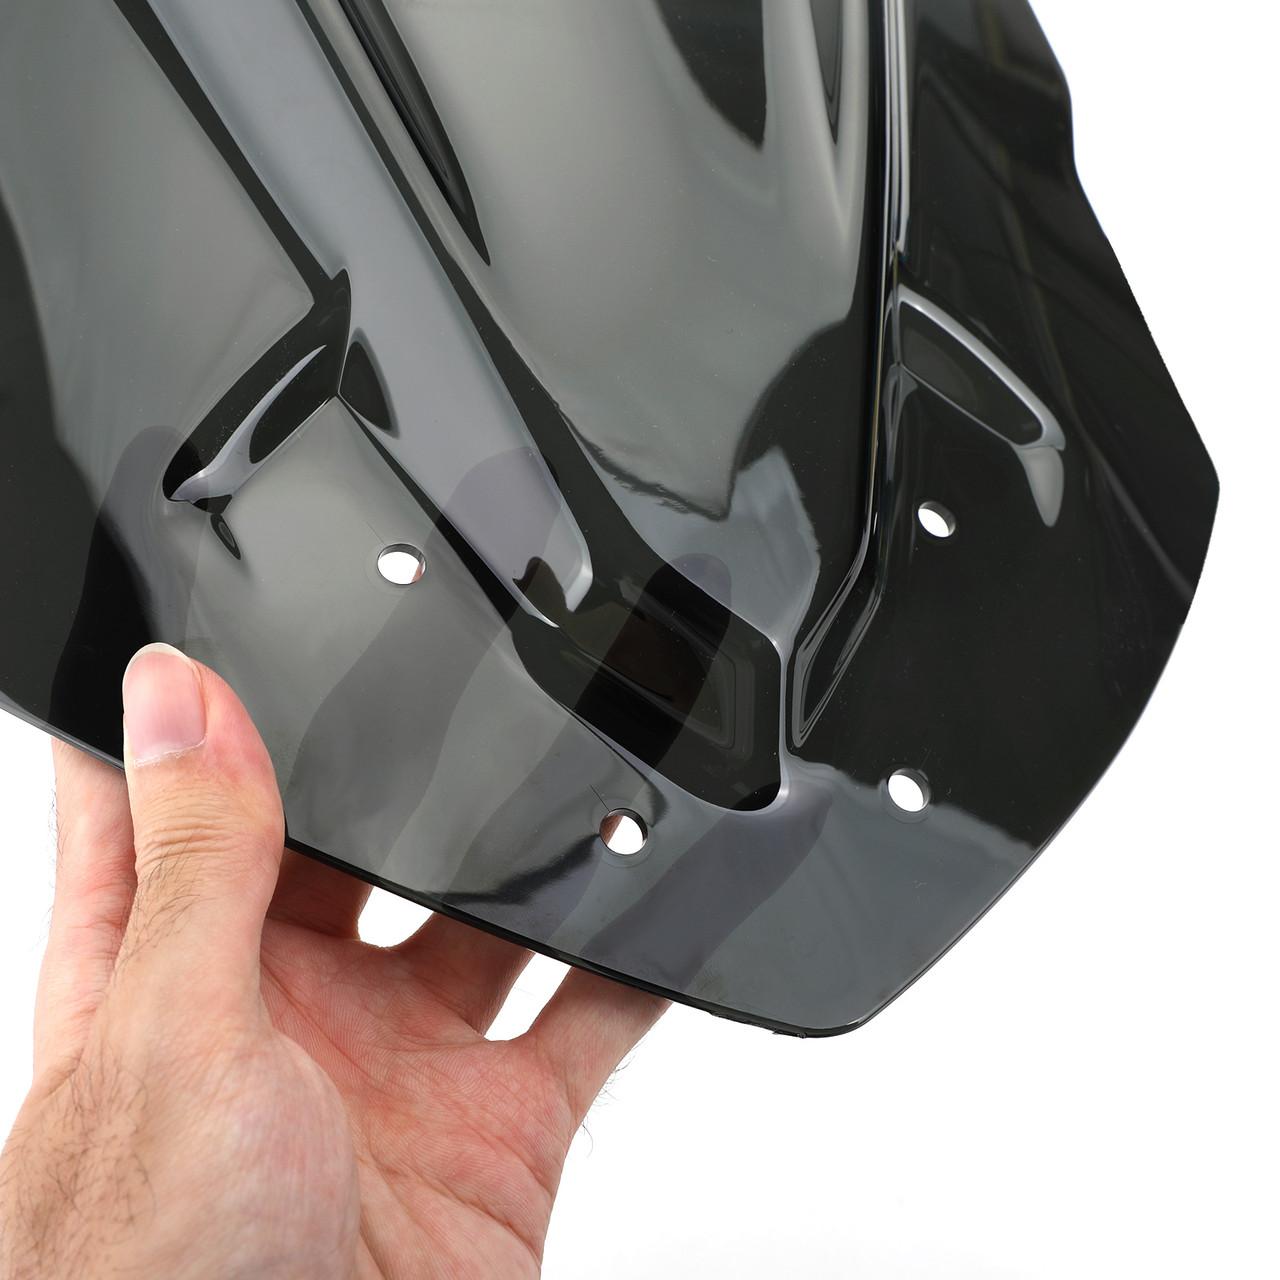 ABS Plastic Windshield Windscreen Fit For Yamaha MT125 15-19 Black